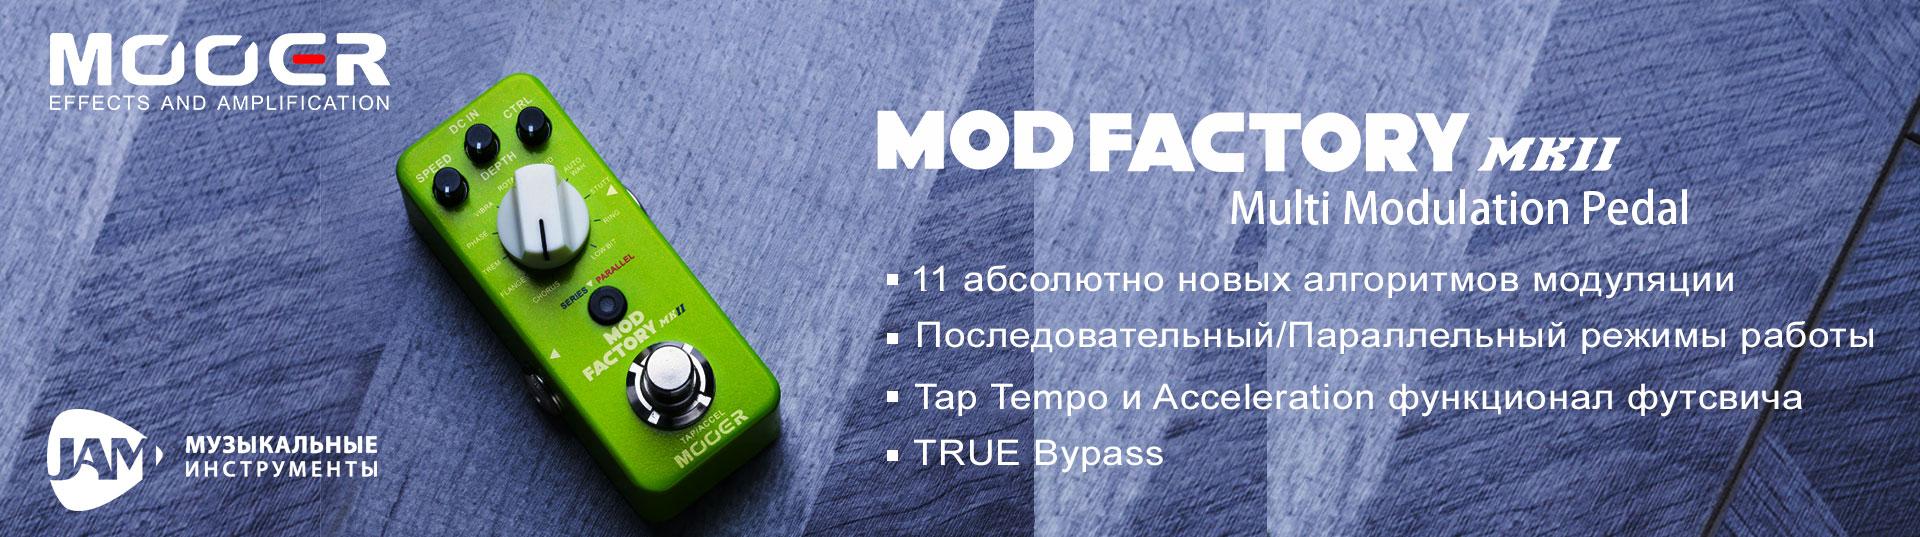 Mooer Mod Factory MKII - JAM.UA